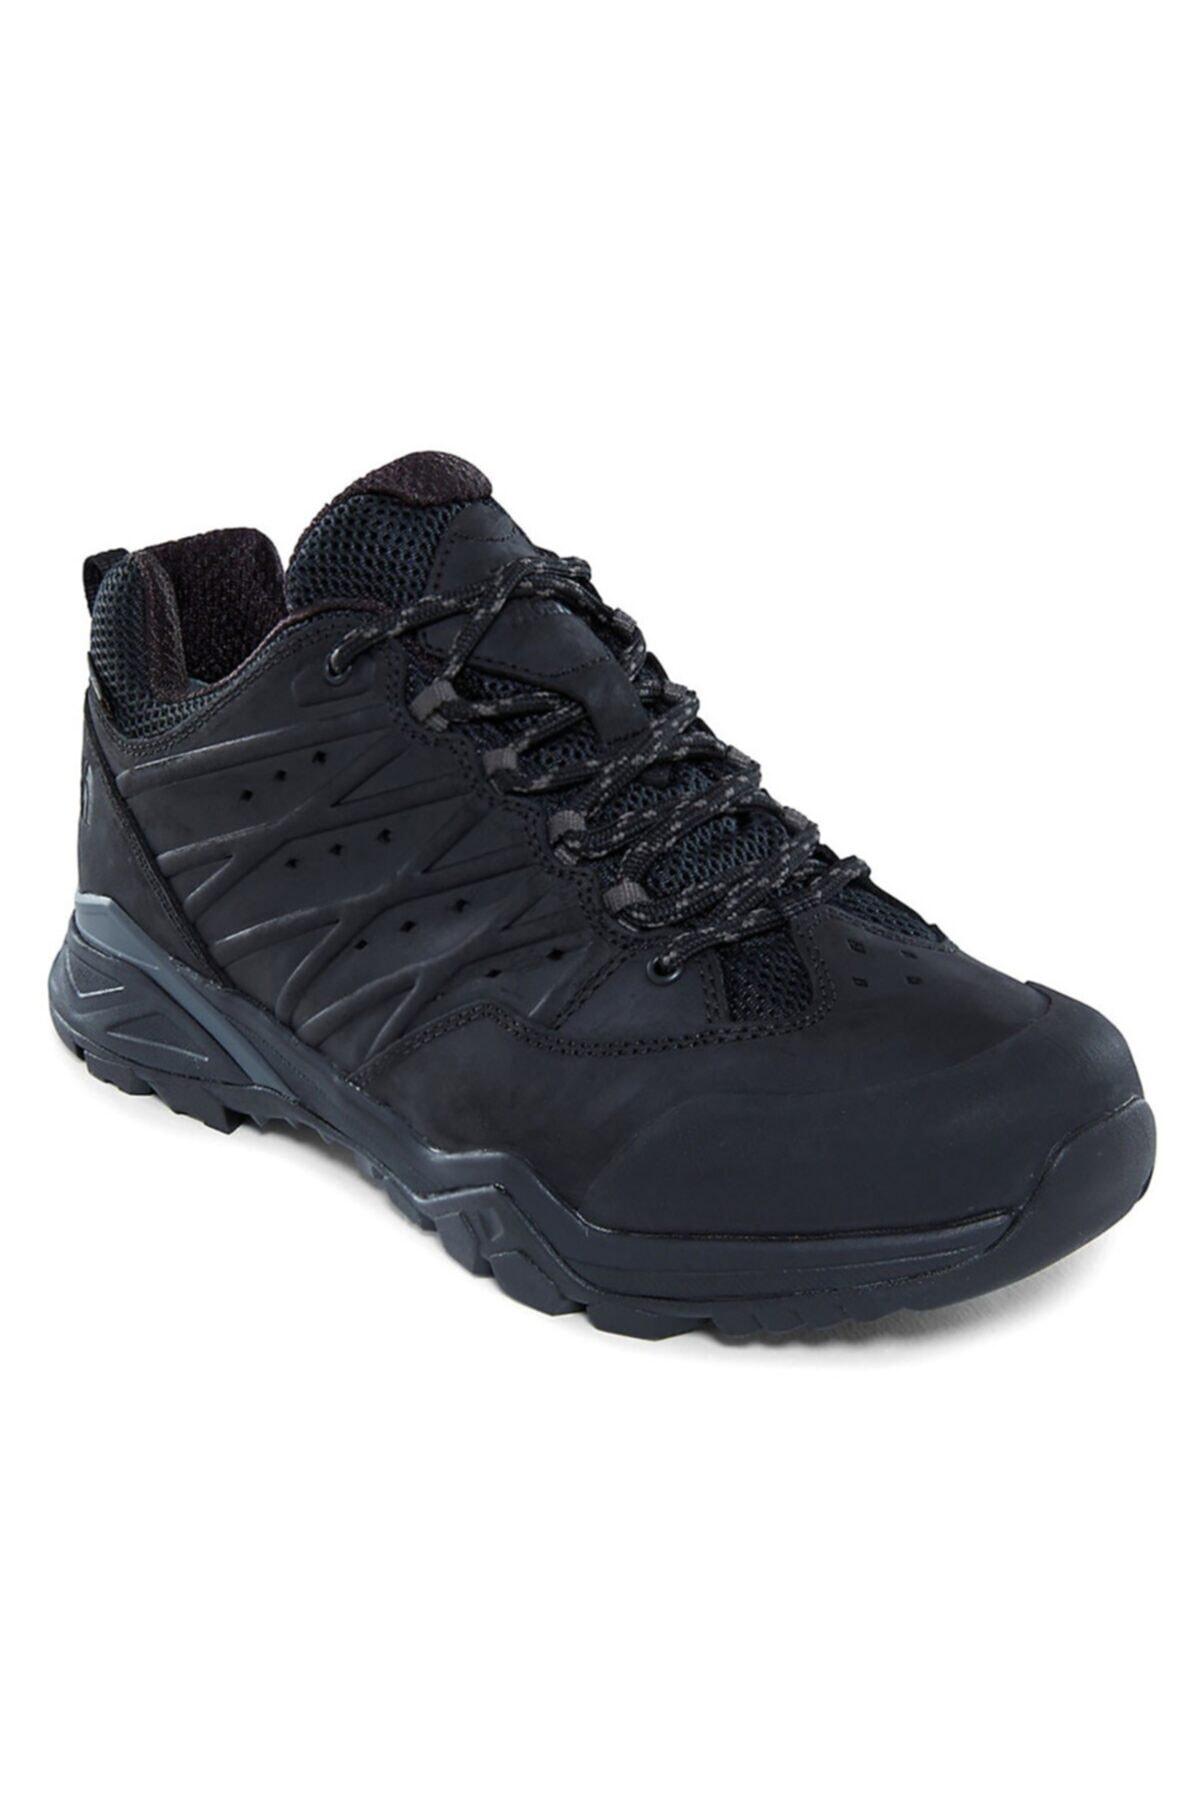 THE NORTH FACE Tnf M Hh Hike Gtx Iı Siyah Gri Erkek Ayakkabı 1